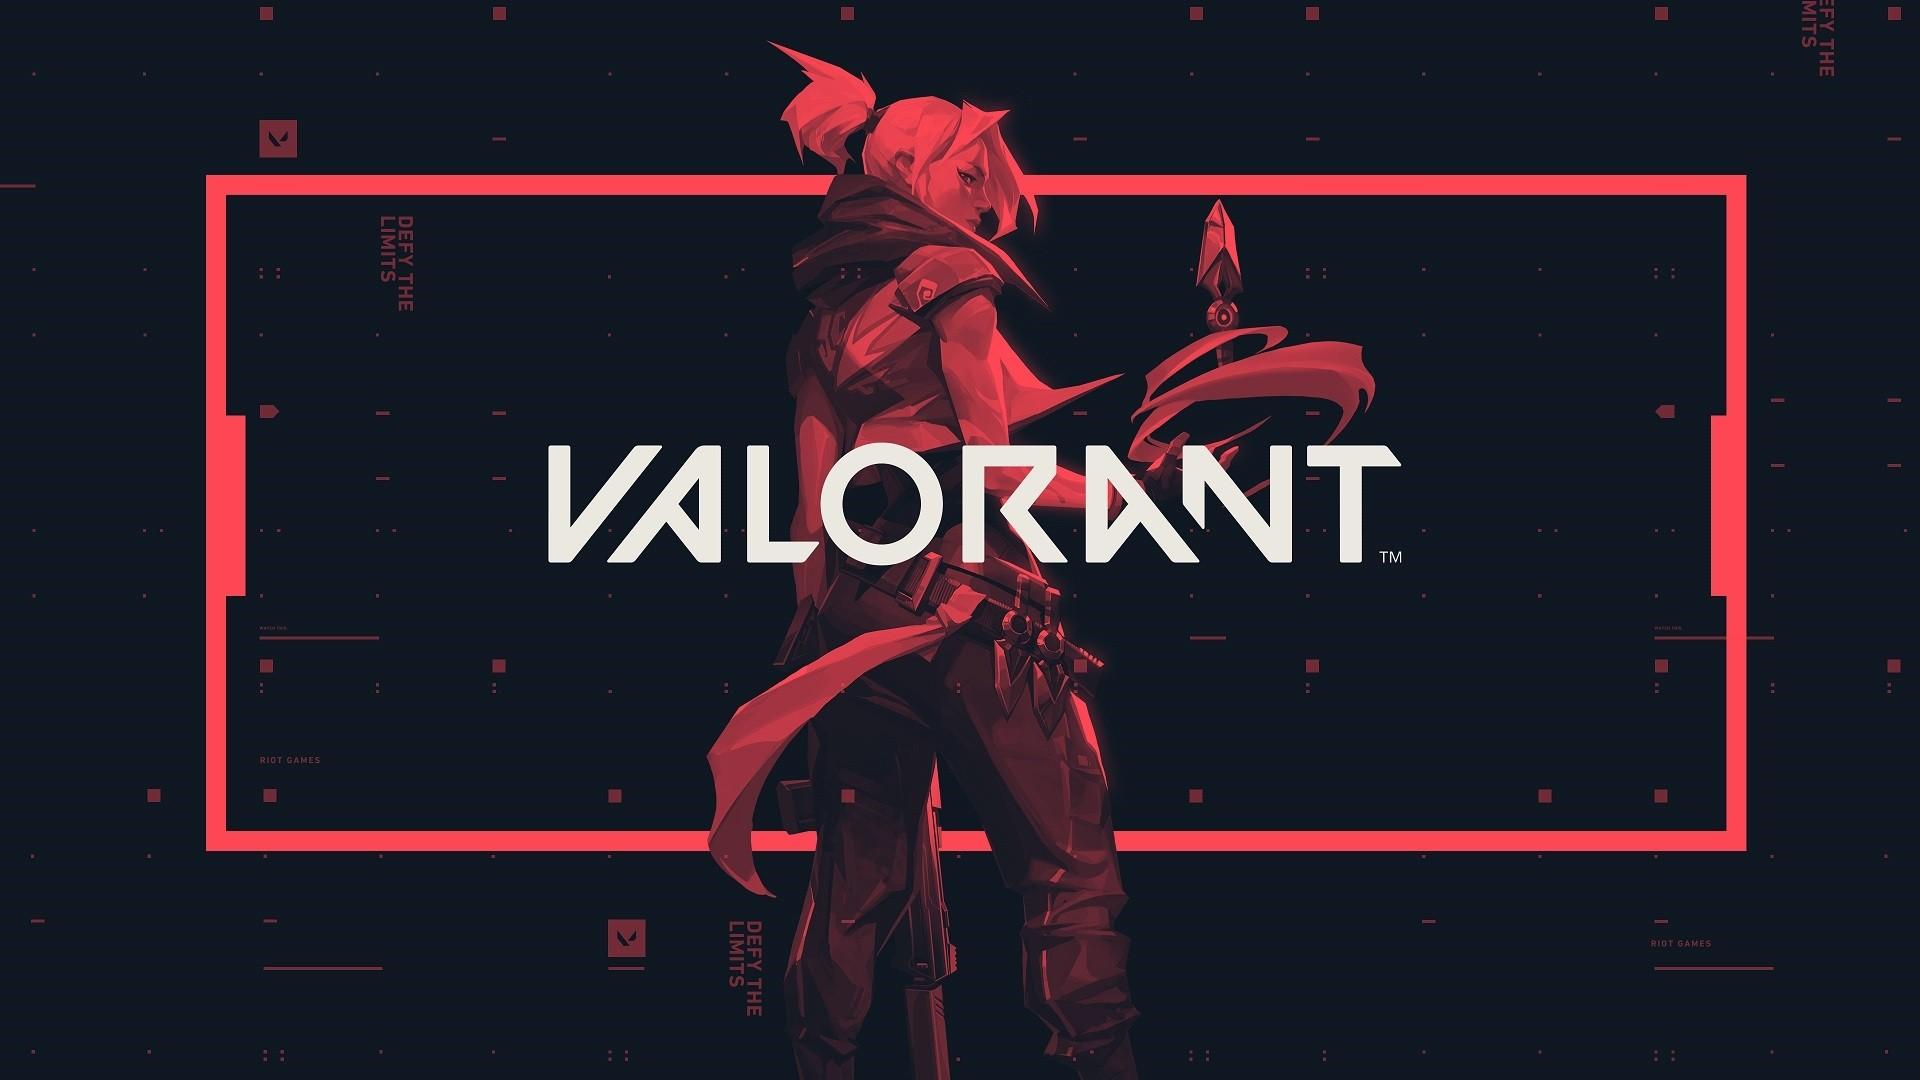 Valorant Wallpaper for pc